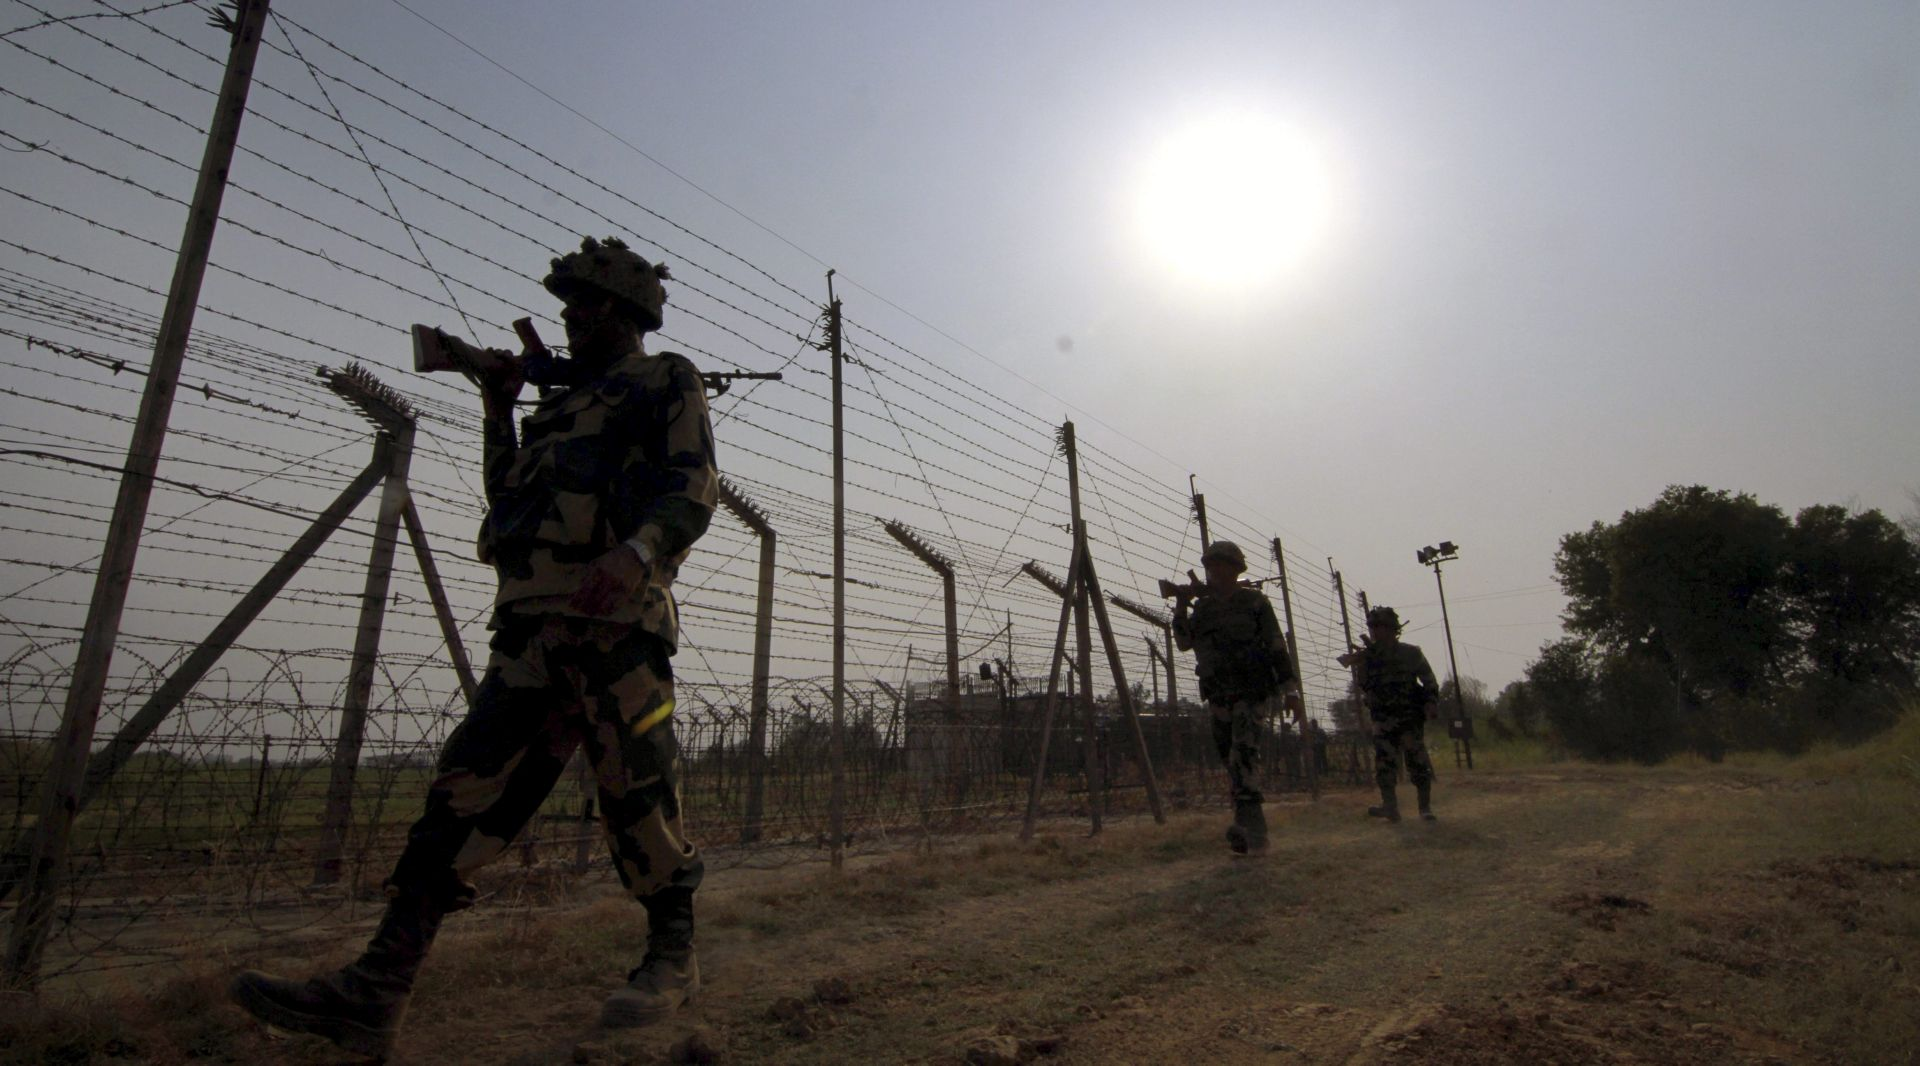 Kina, Afganistan i Pakistan pozvali talibane da se priključe pregovorima